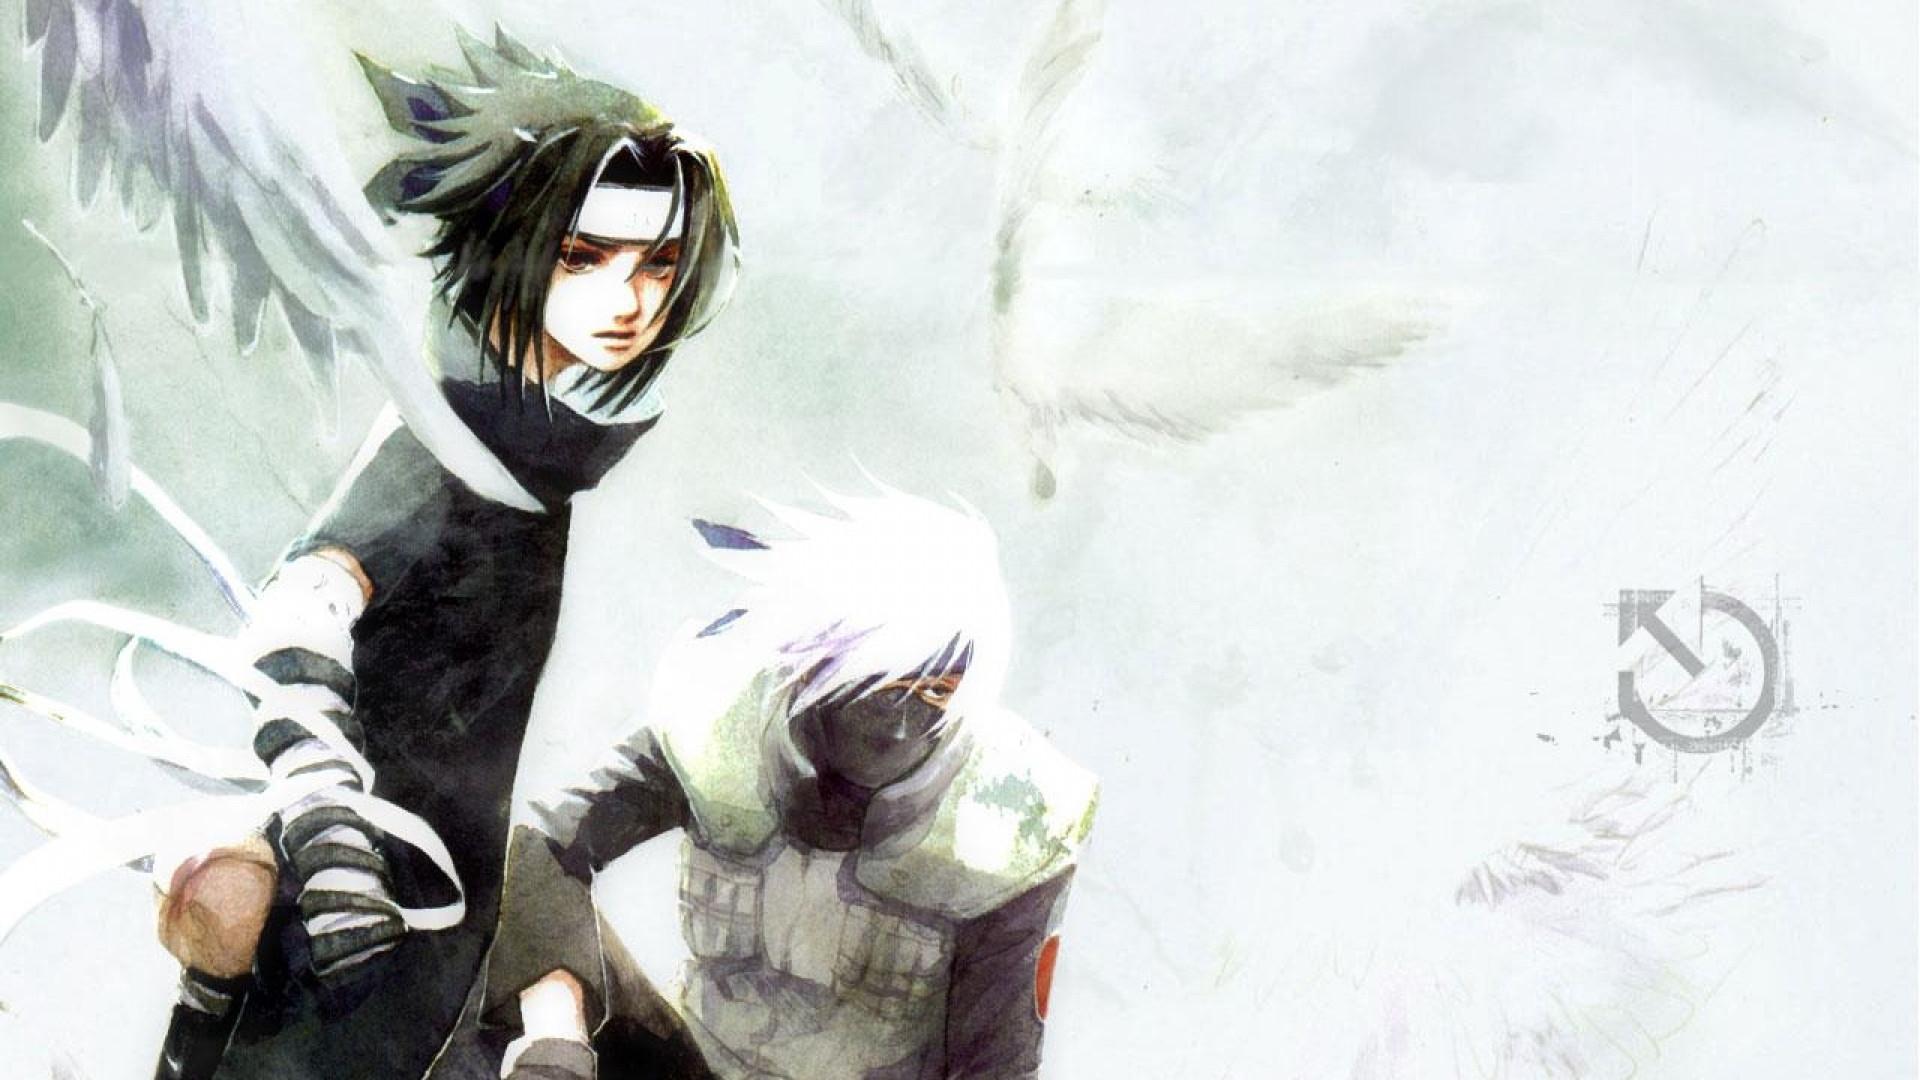 sasuke uchiha young kakashi hatake full hd wallpaper 1080p